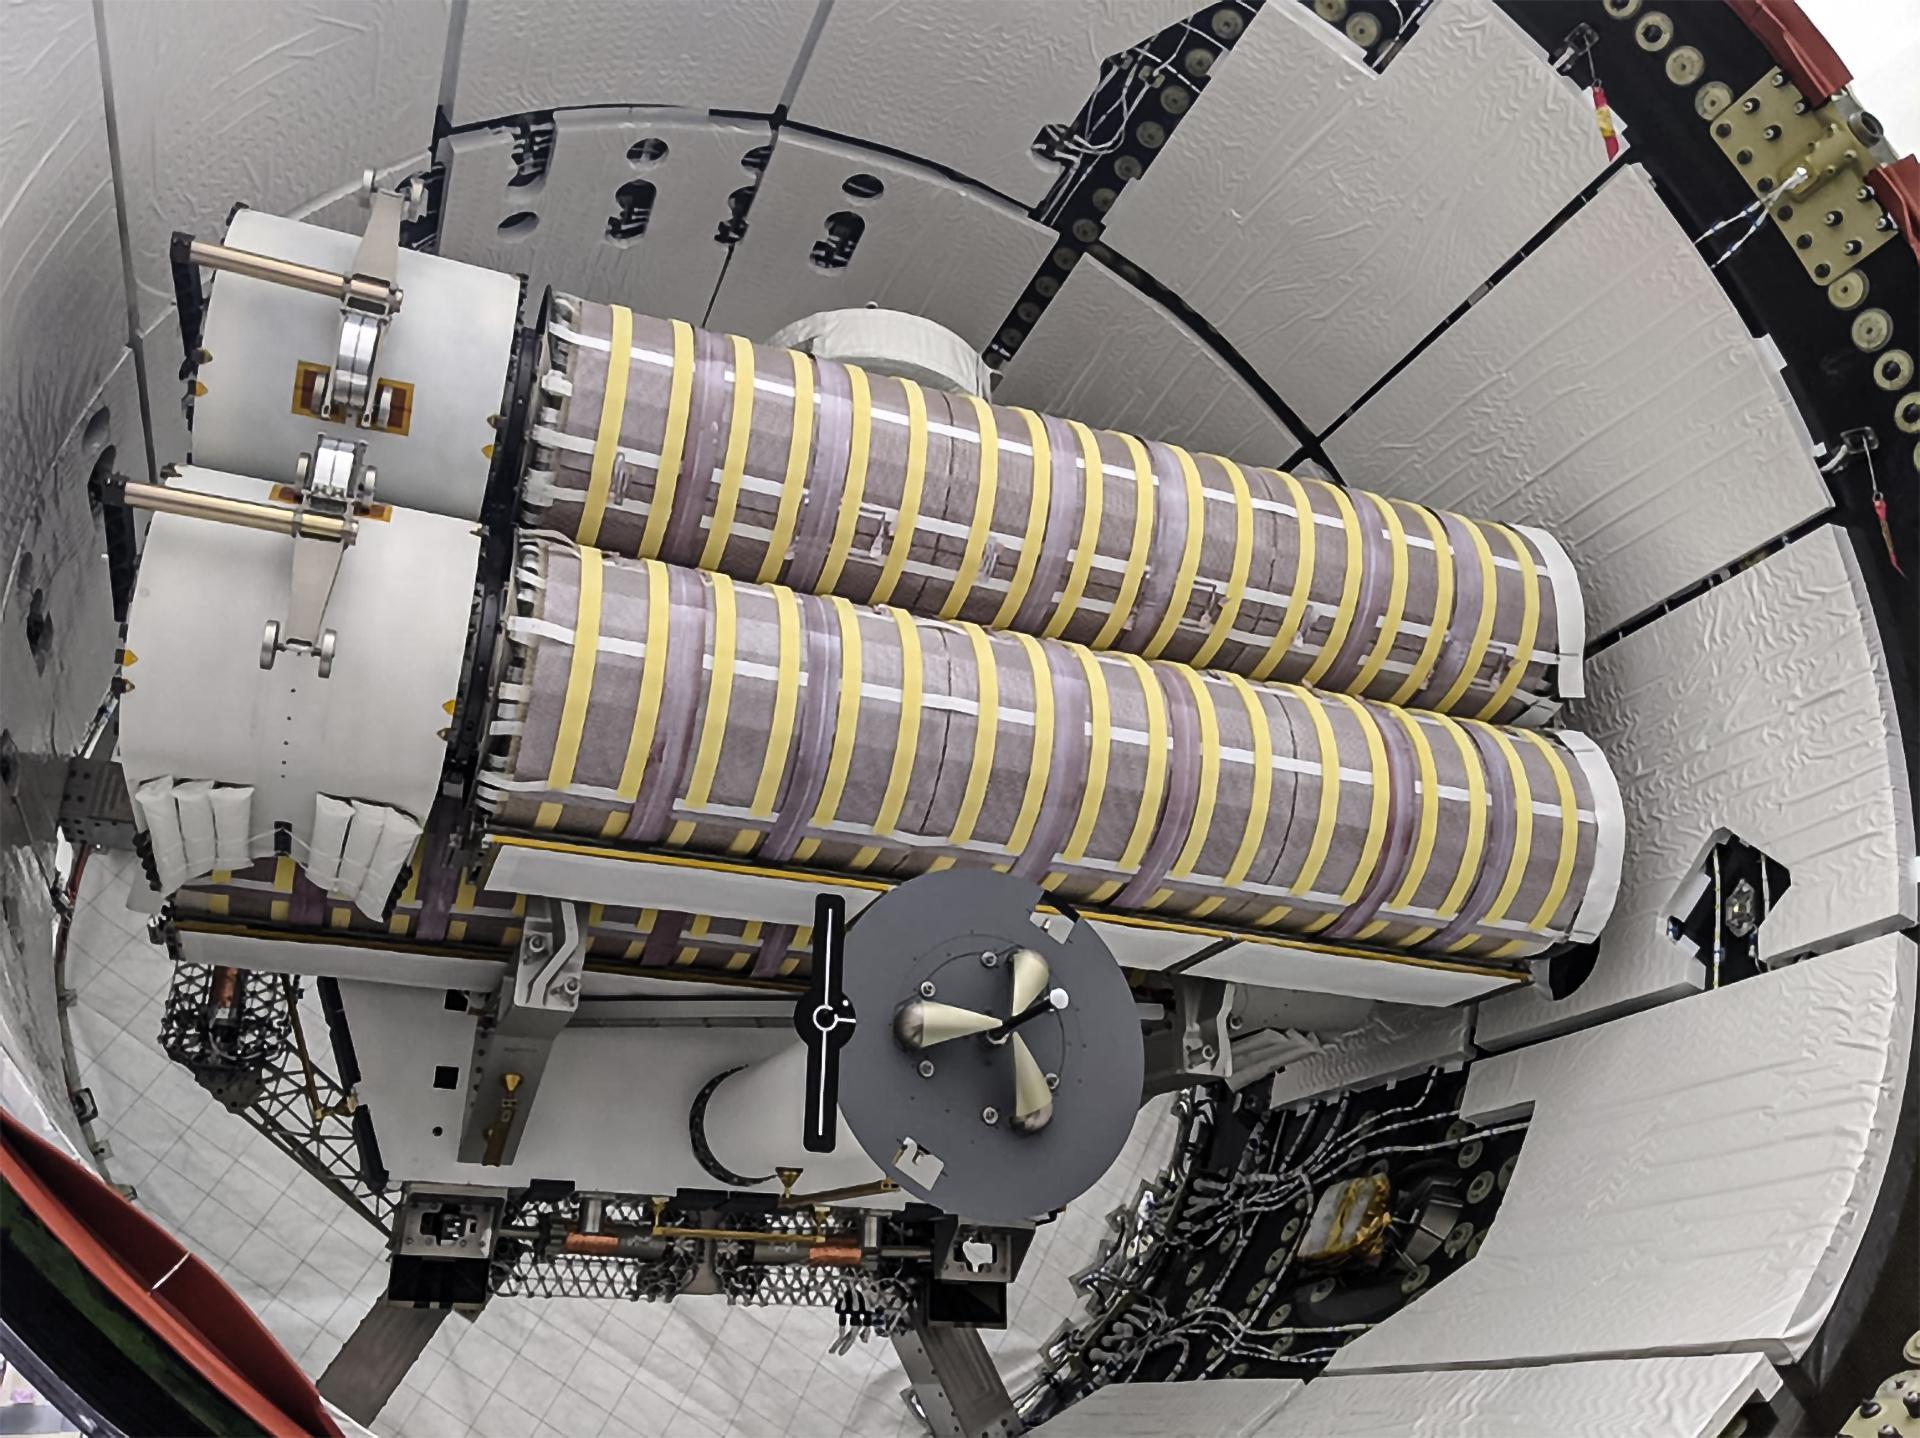 CRS-22 Cargo Dragon C209 iROSA solar array trunk install 052021 (SpaceX) 1